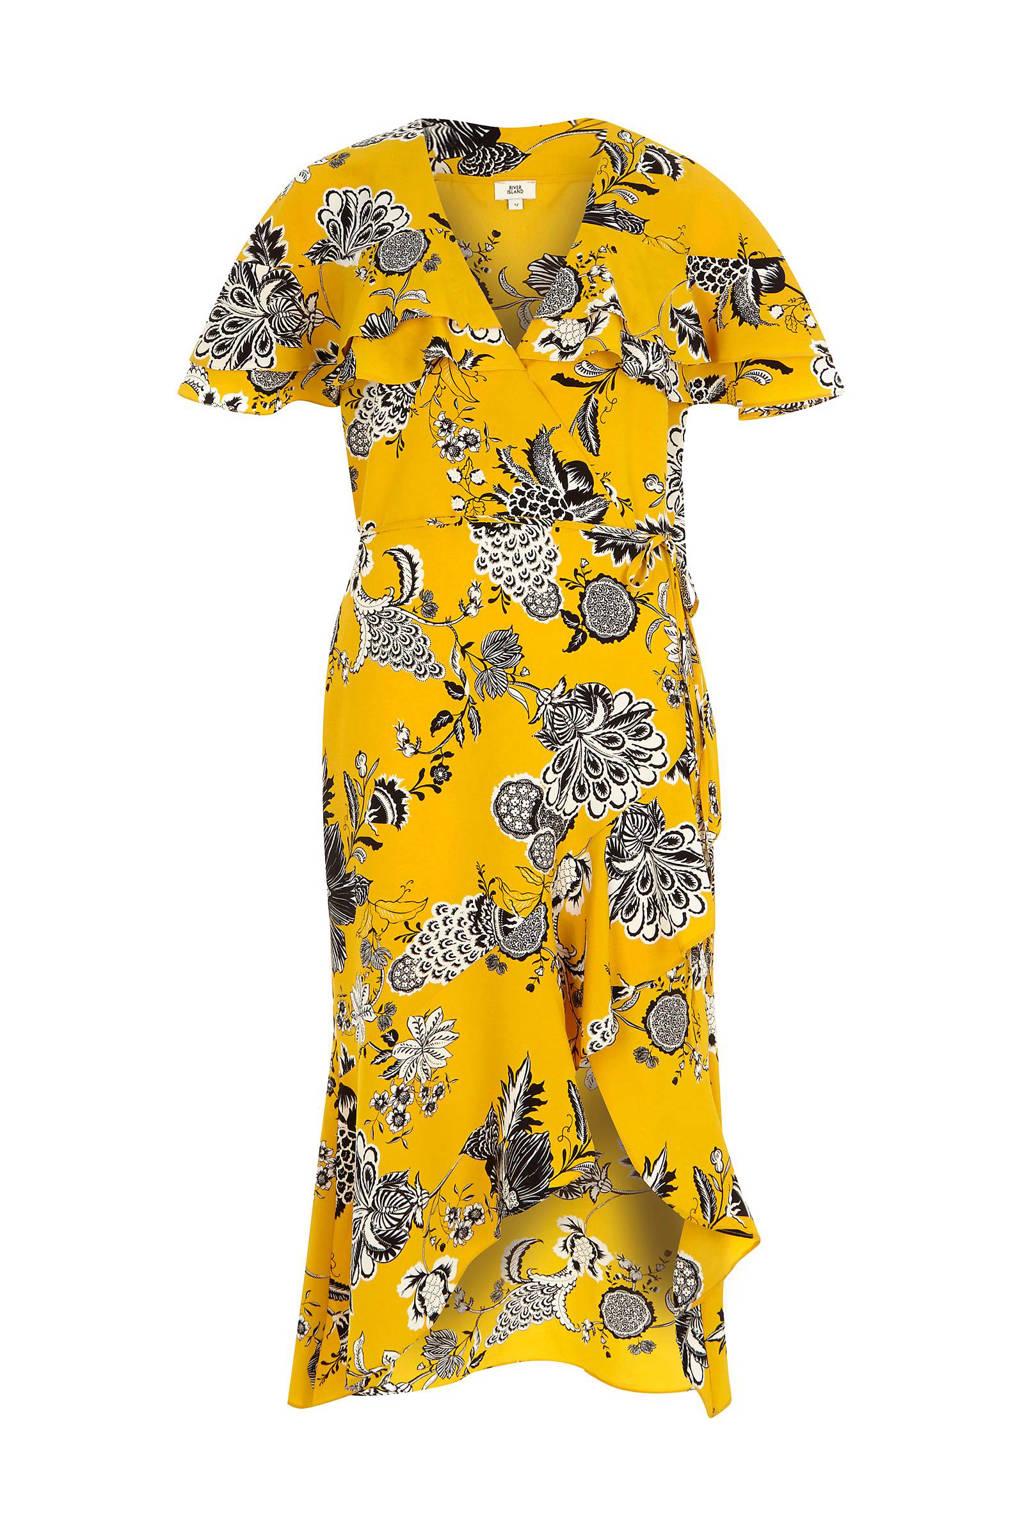 d4b070c322b16c River Island overslag jurk met bloemenprint